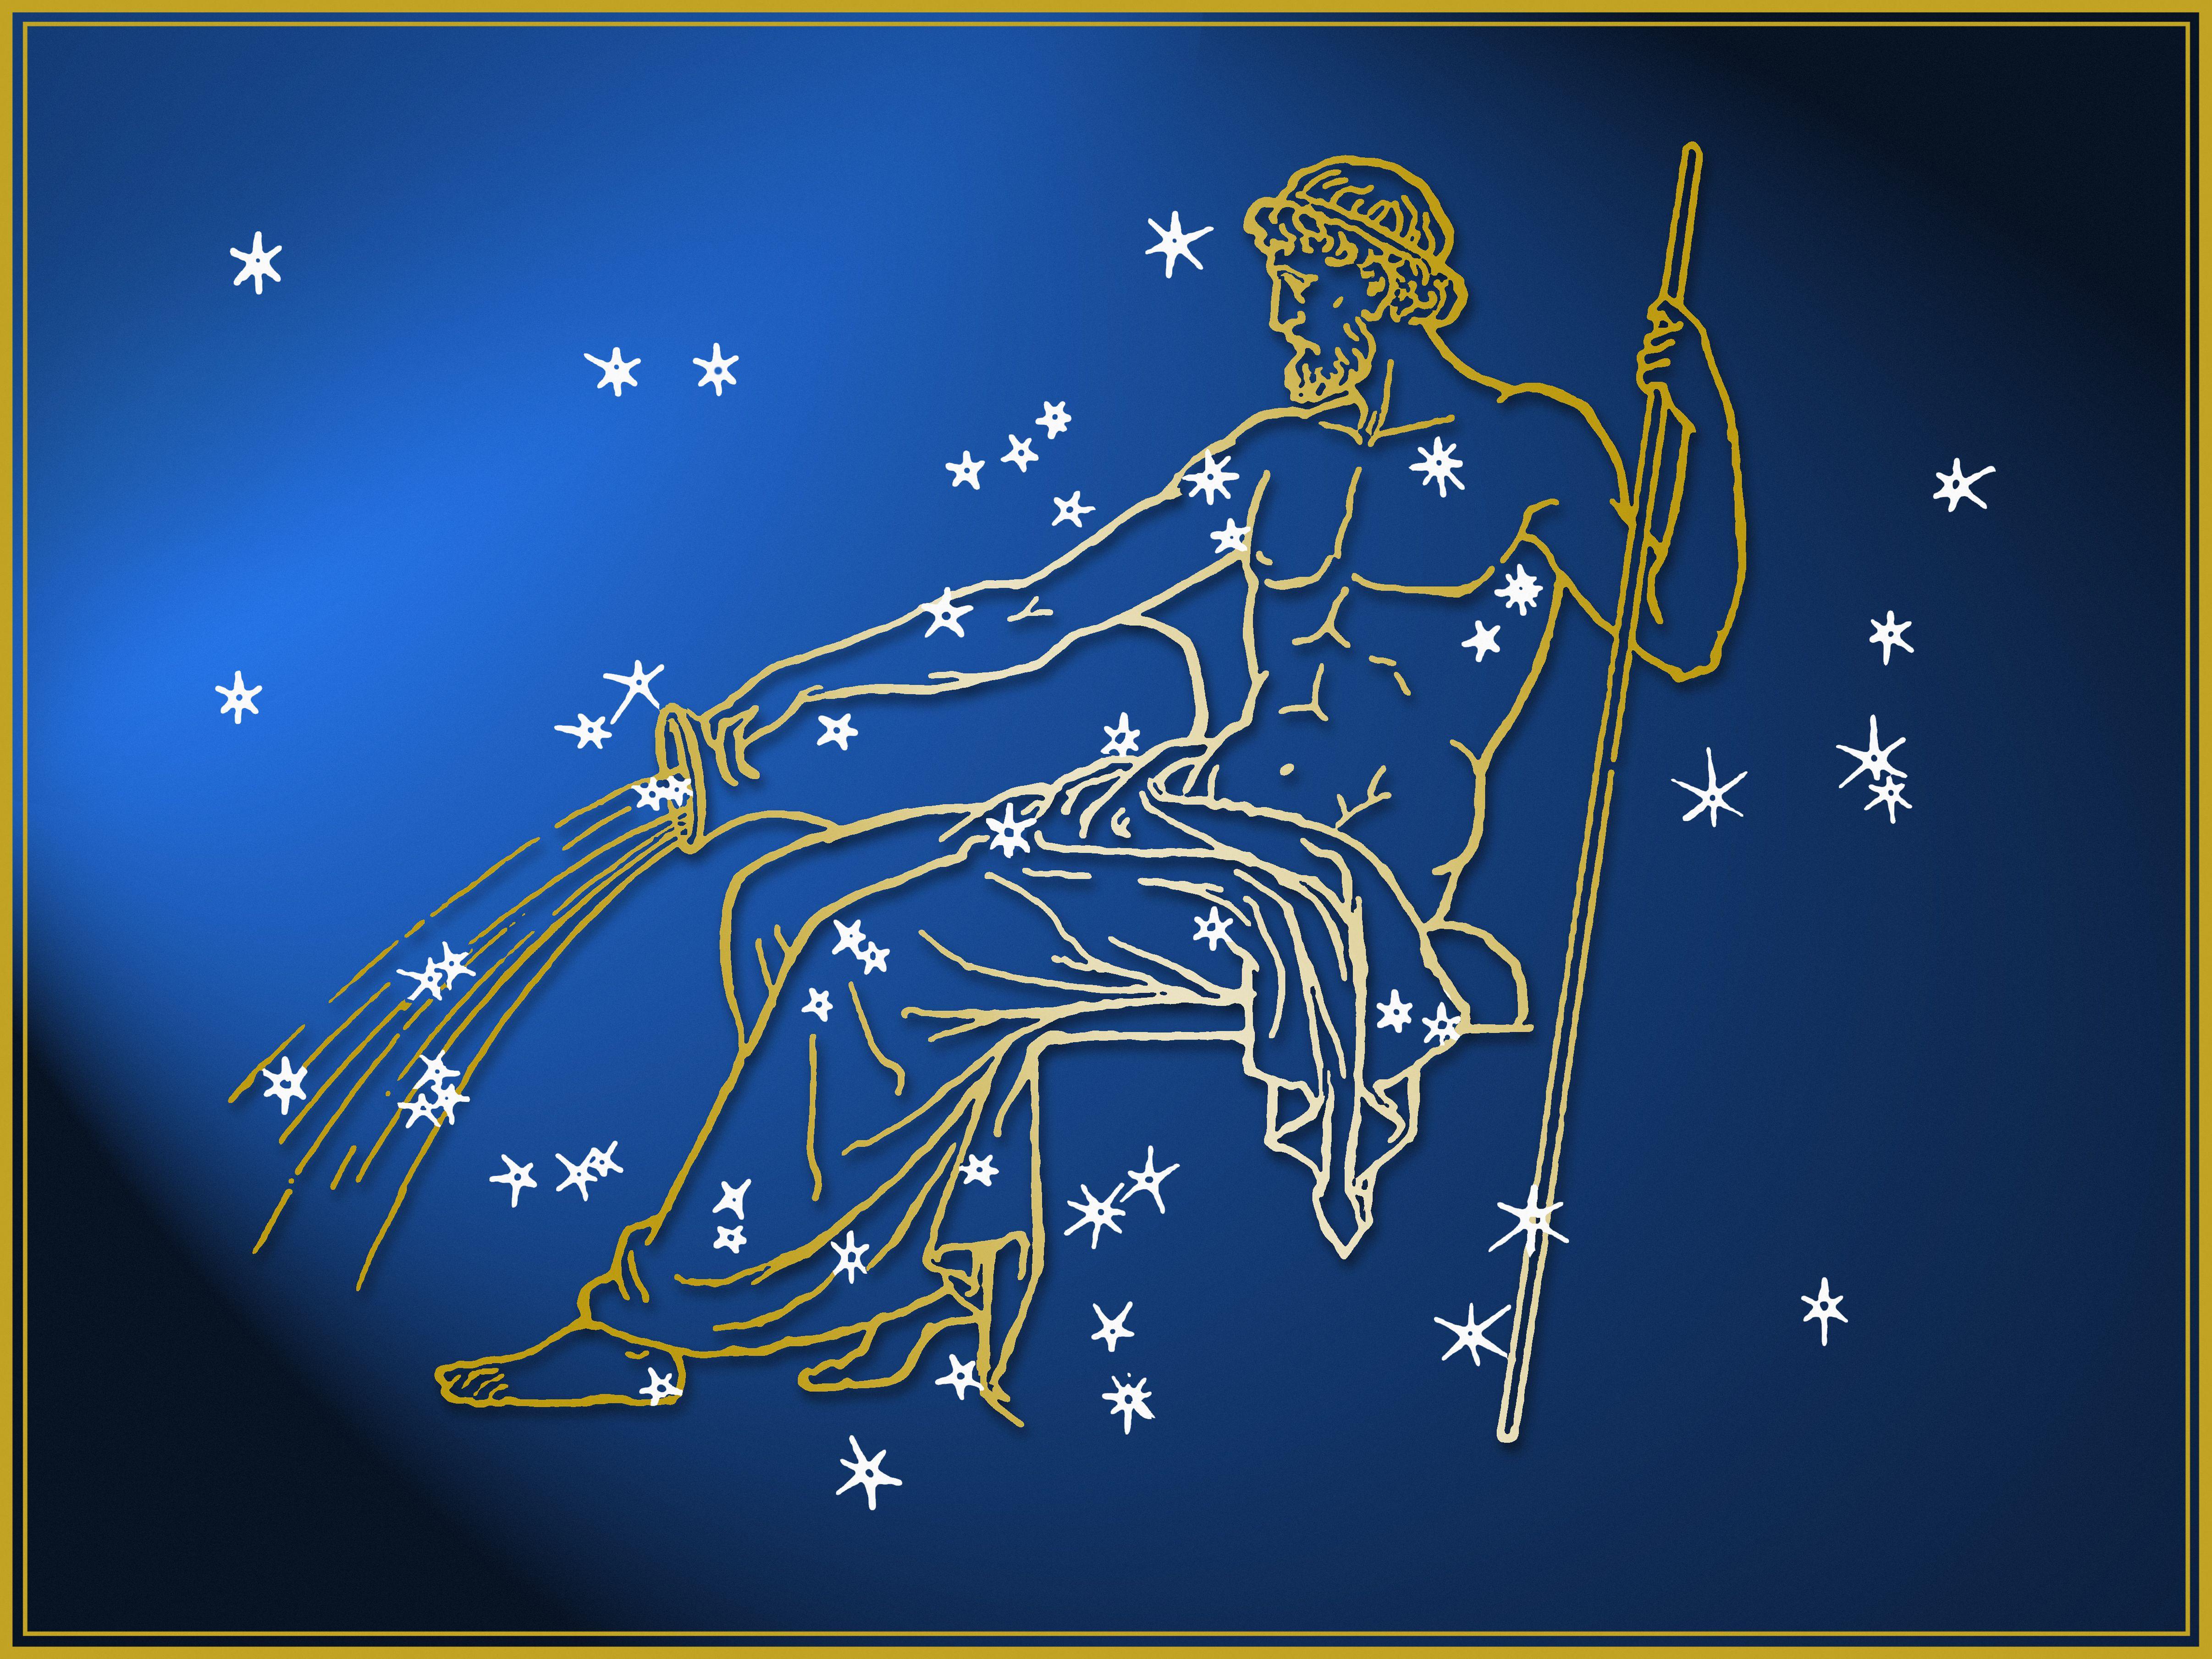 Venus in Aquarius Tendencies and Traits